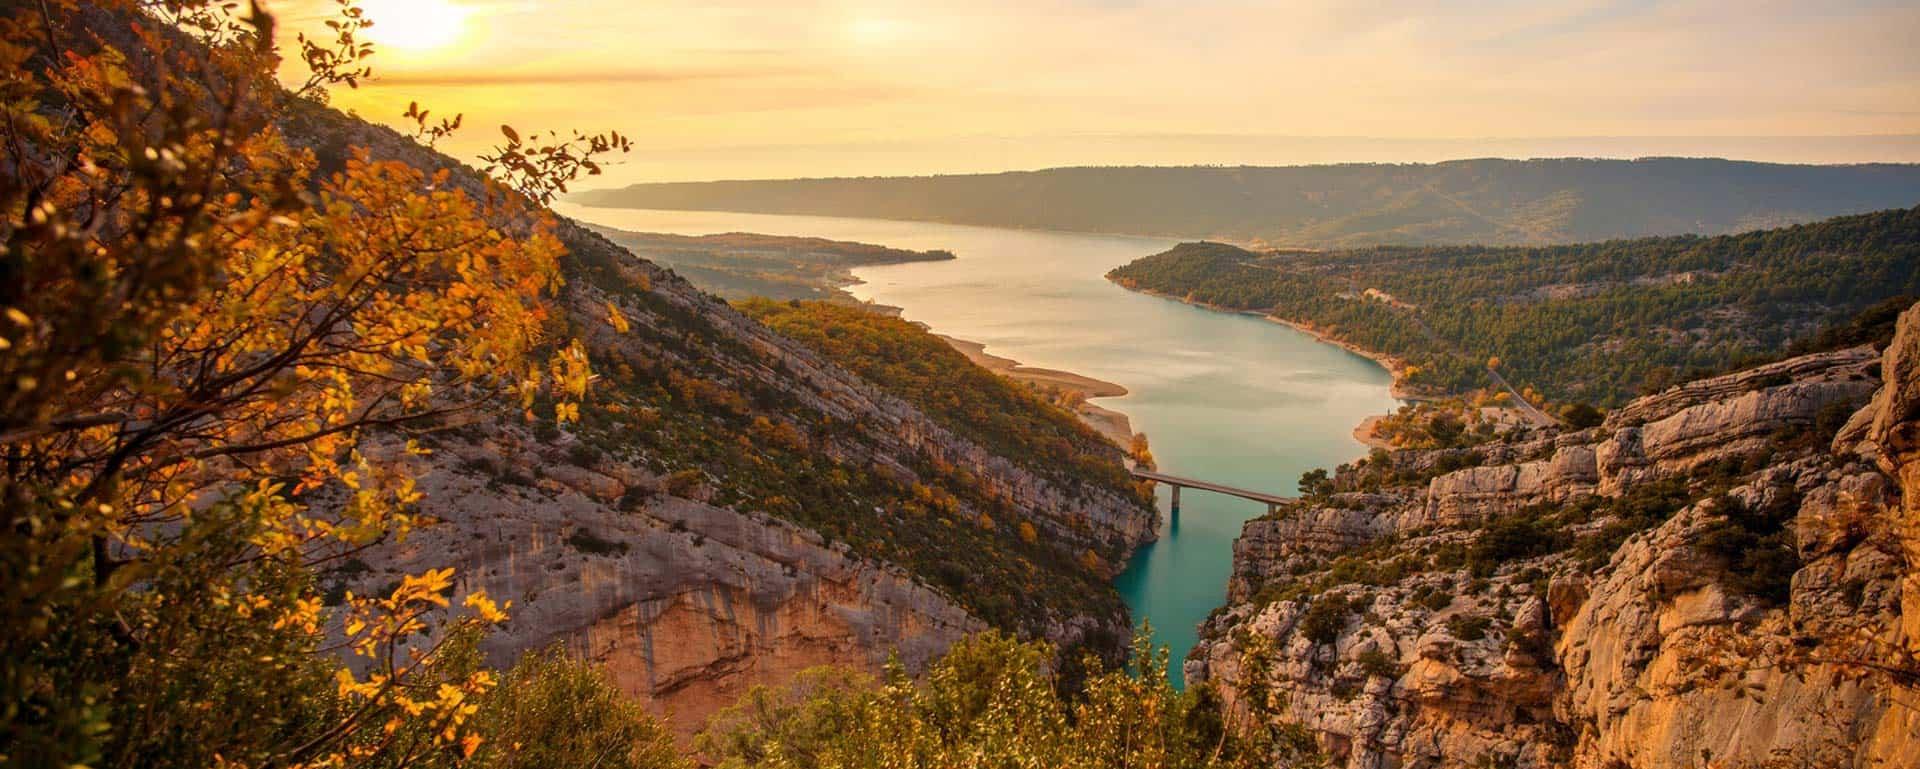 10 endroits incontournables en France